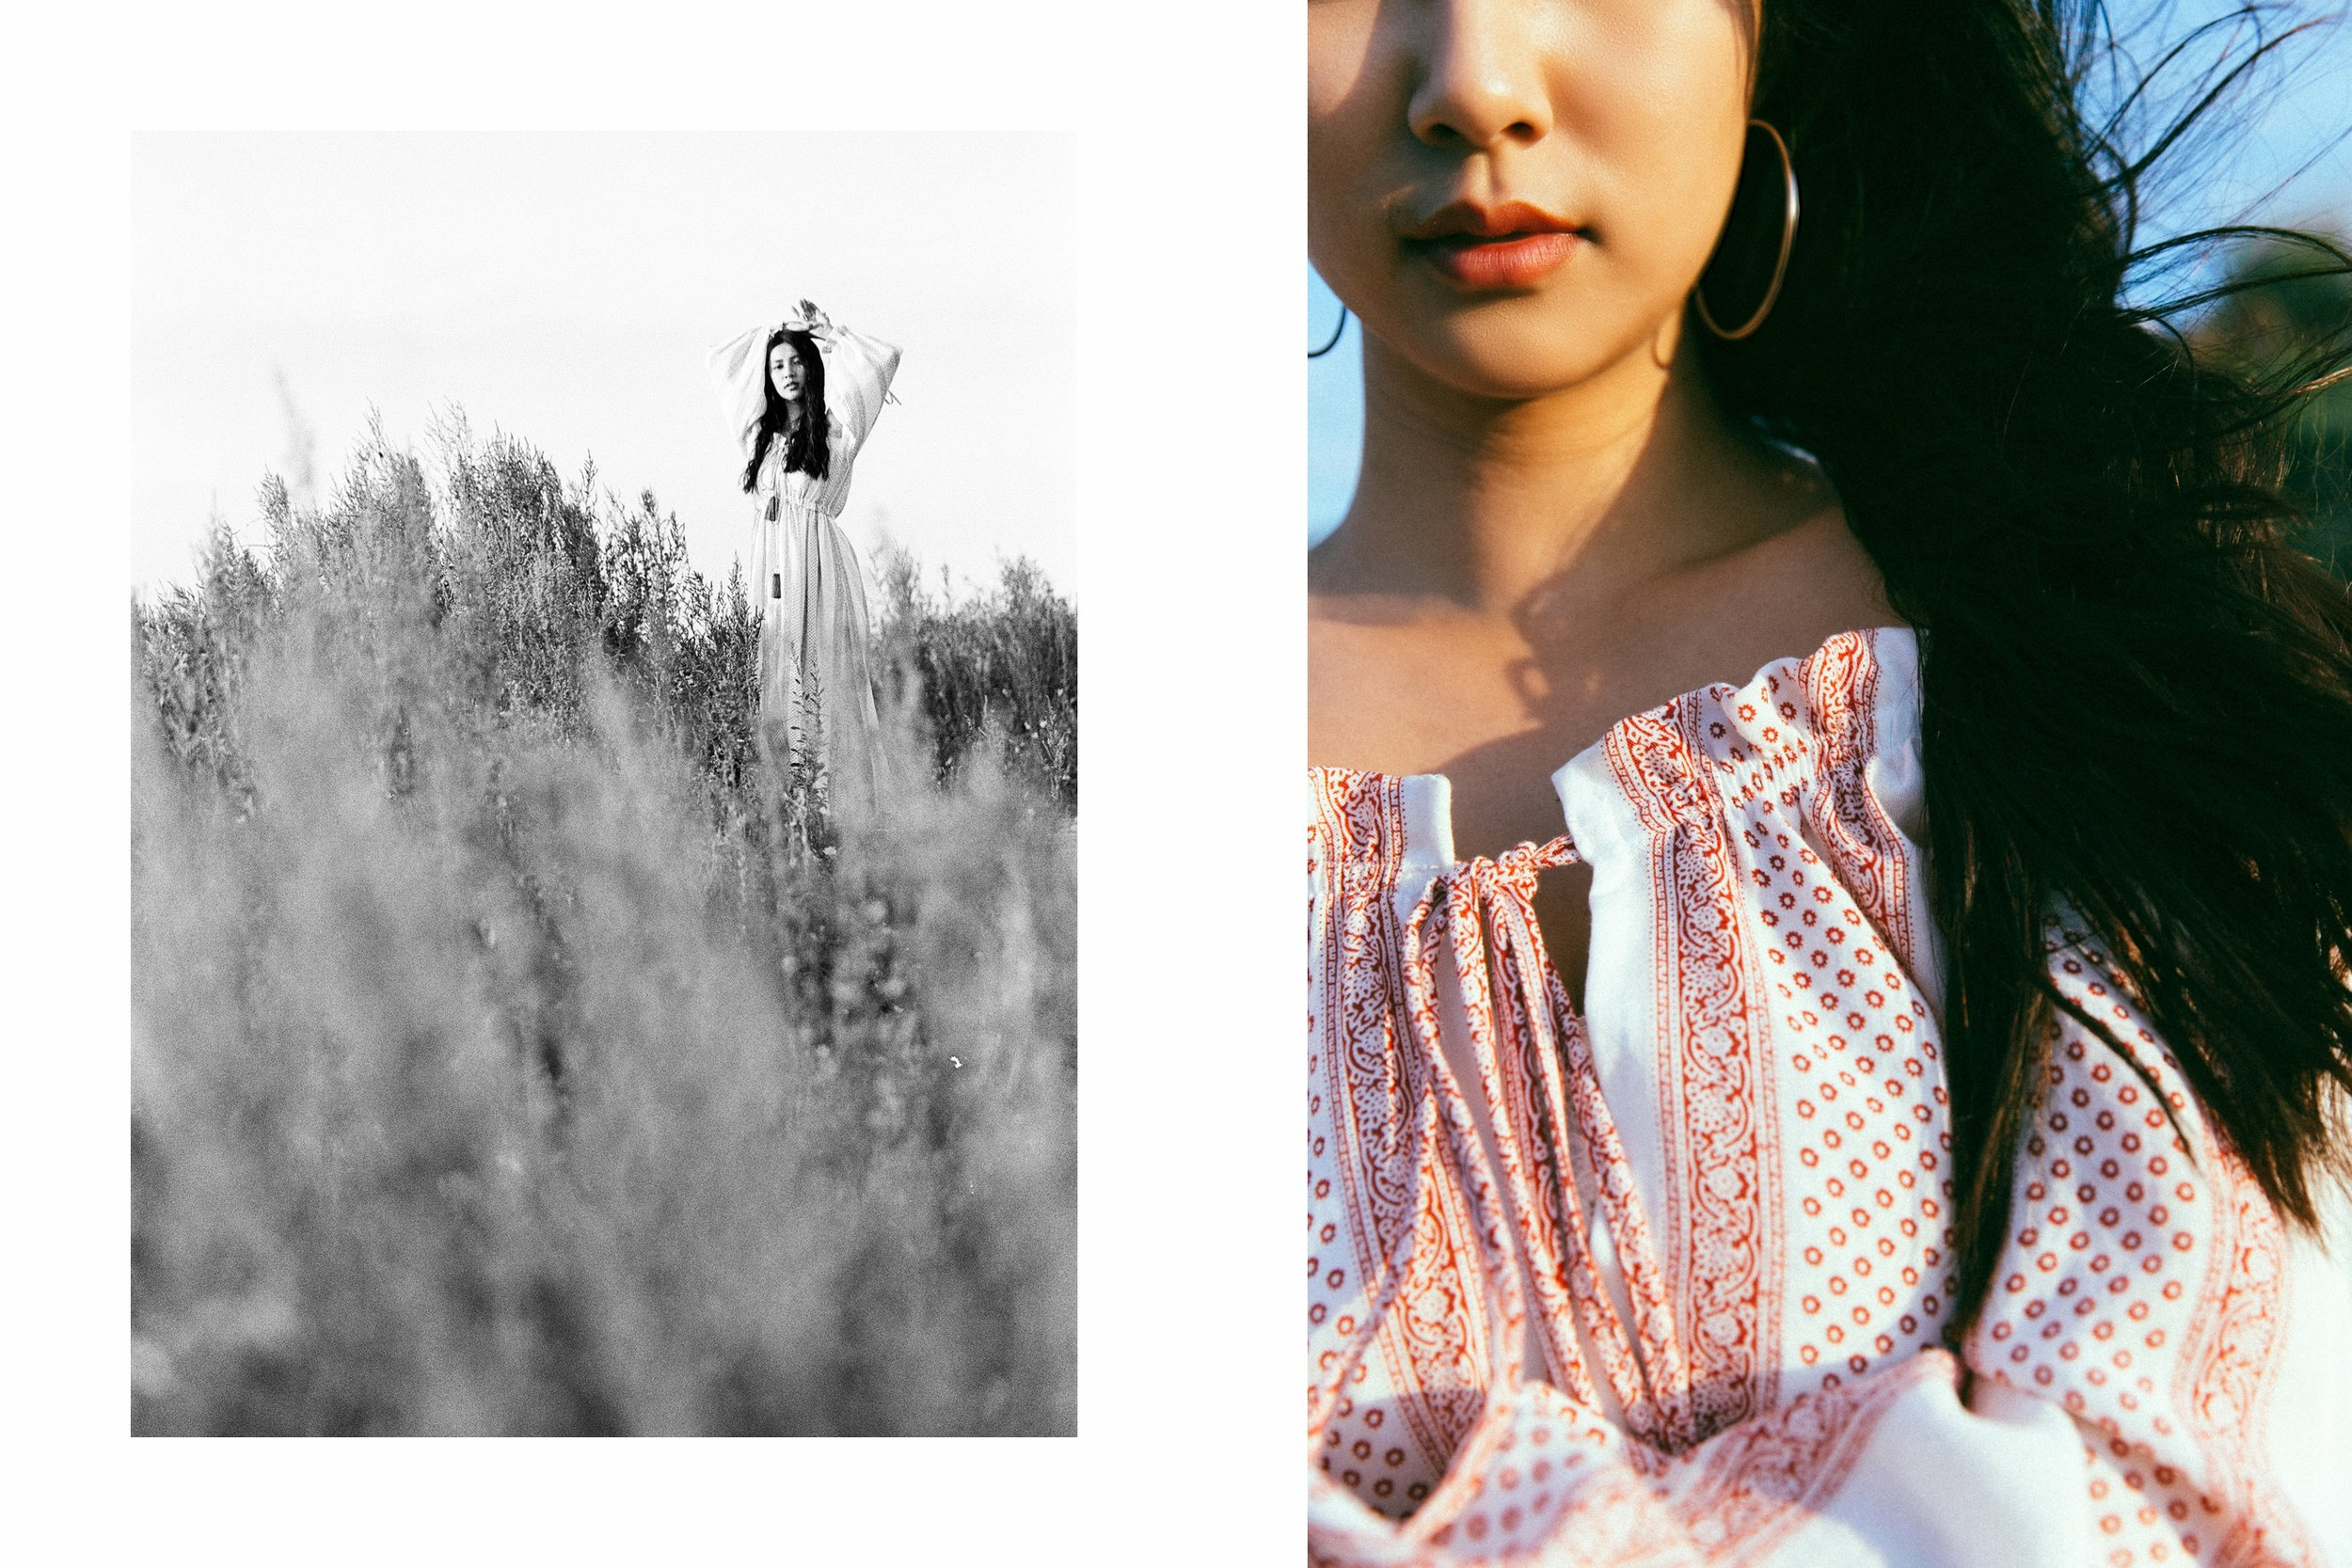 portrait-jane-girl-寫真-許厝港-桃園-41.jpg